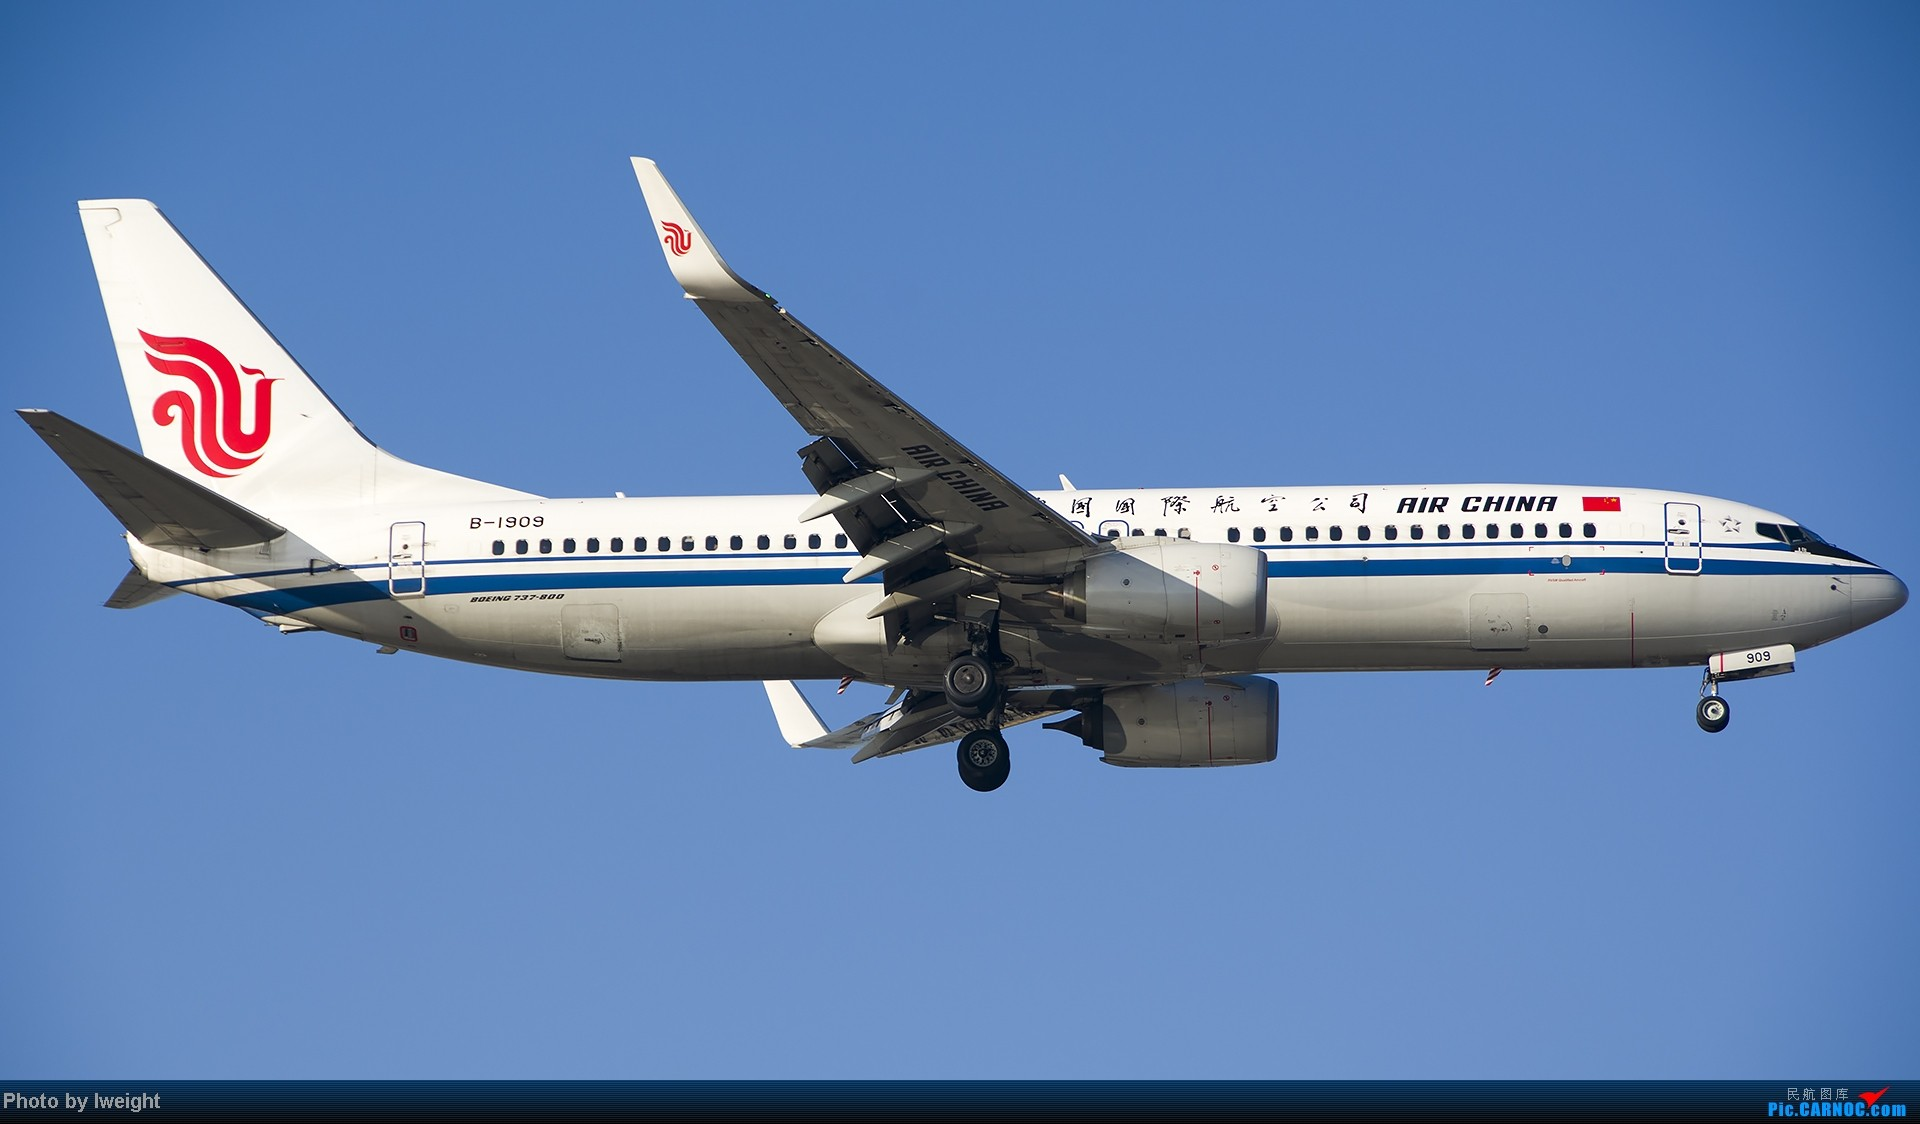 Re:[原创]抓住APEC蓝的尾巴,再拍上一组 BOEING 737-800 B-1909 中国北京首都机场